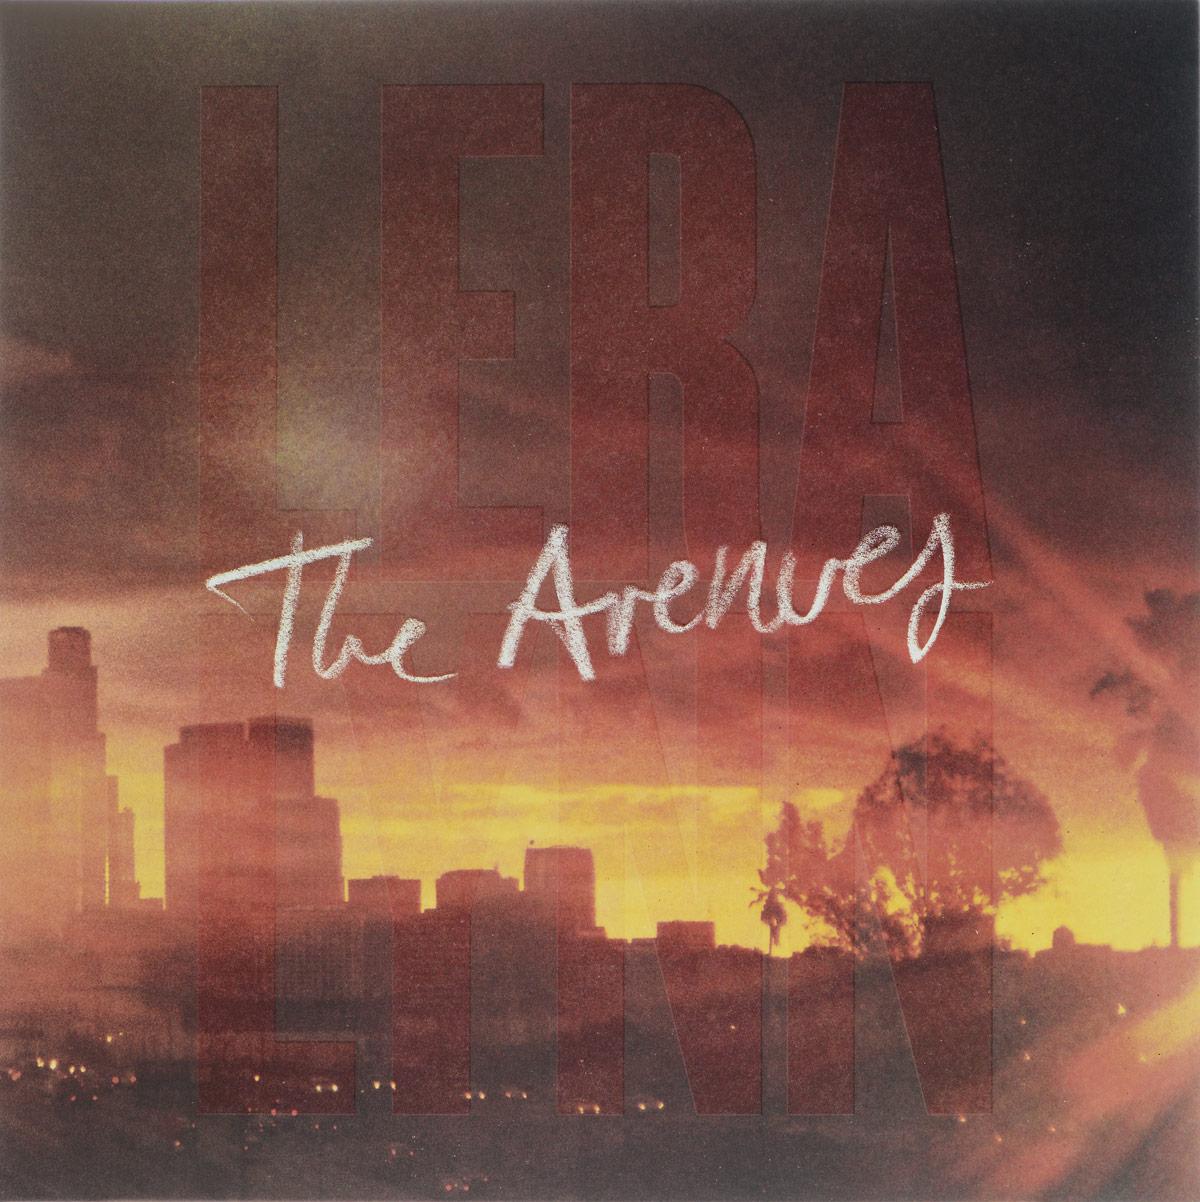 Лера Линн Lera Lynn. The Avenues (LP) barbara lynn barbara lynn you ll loose a good thing